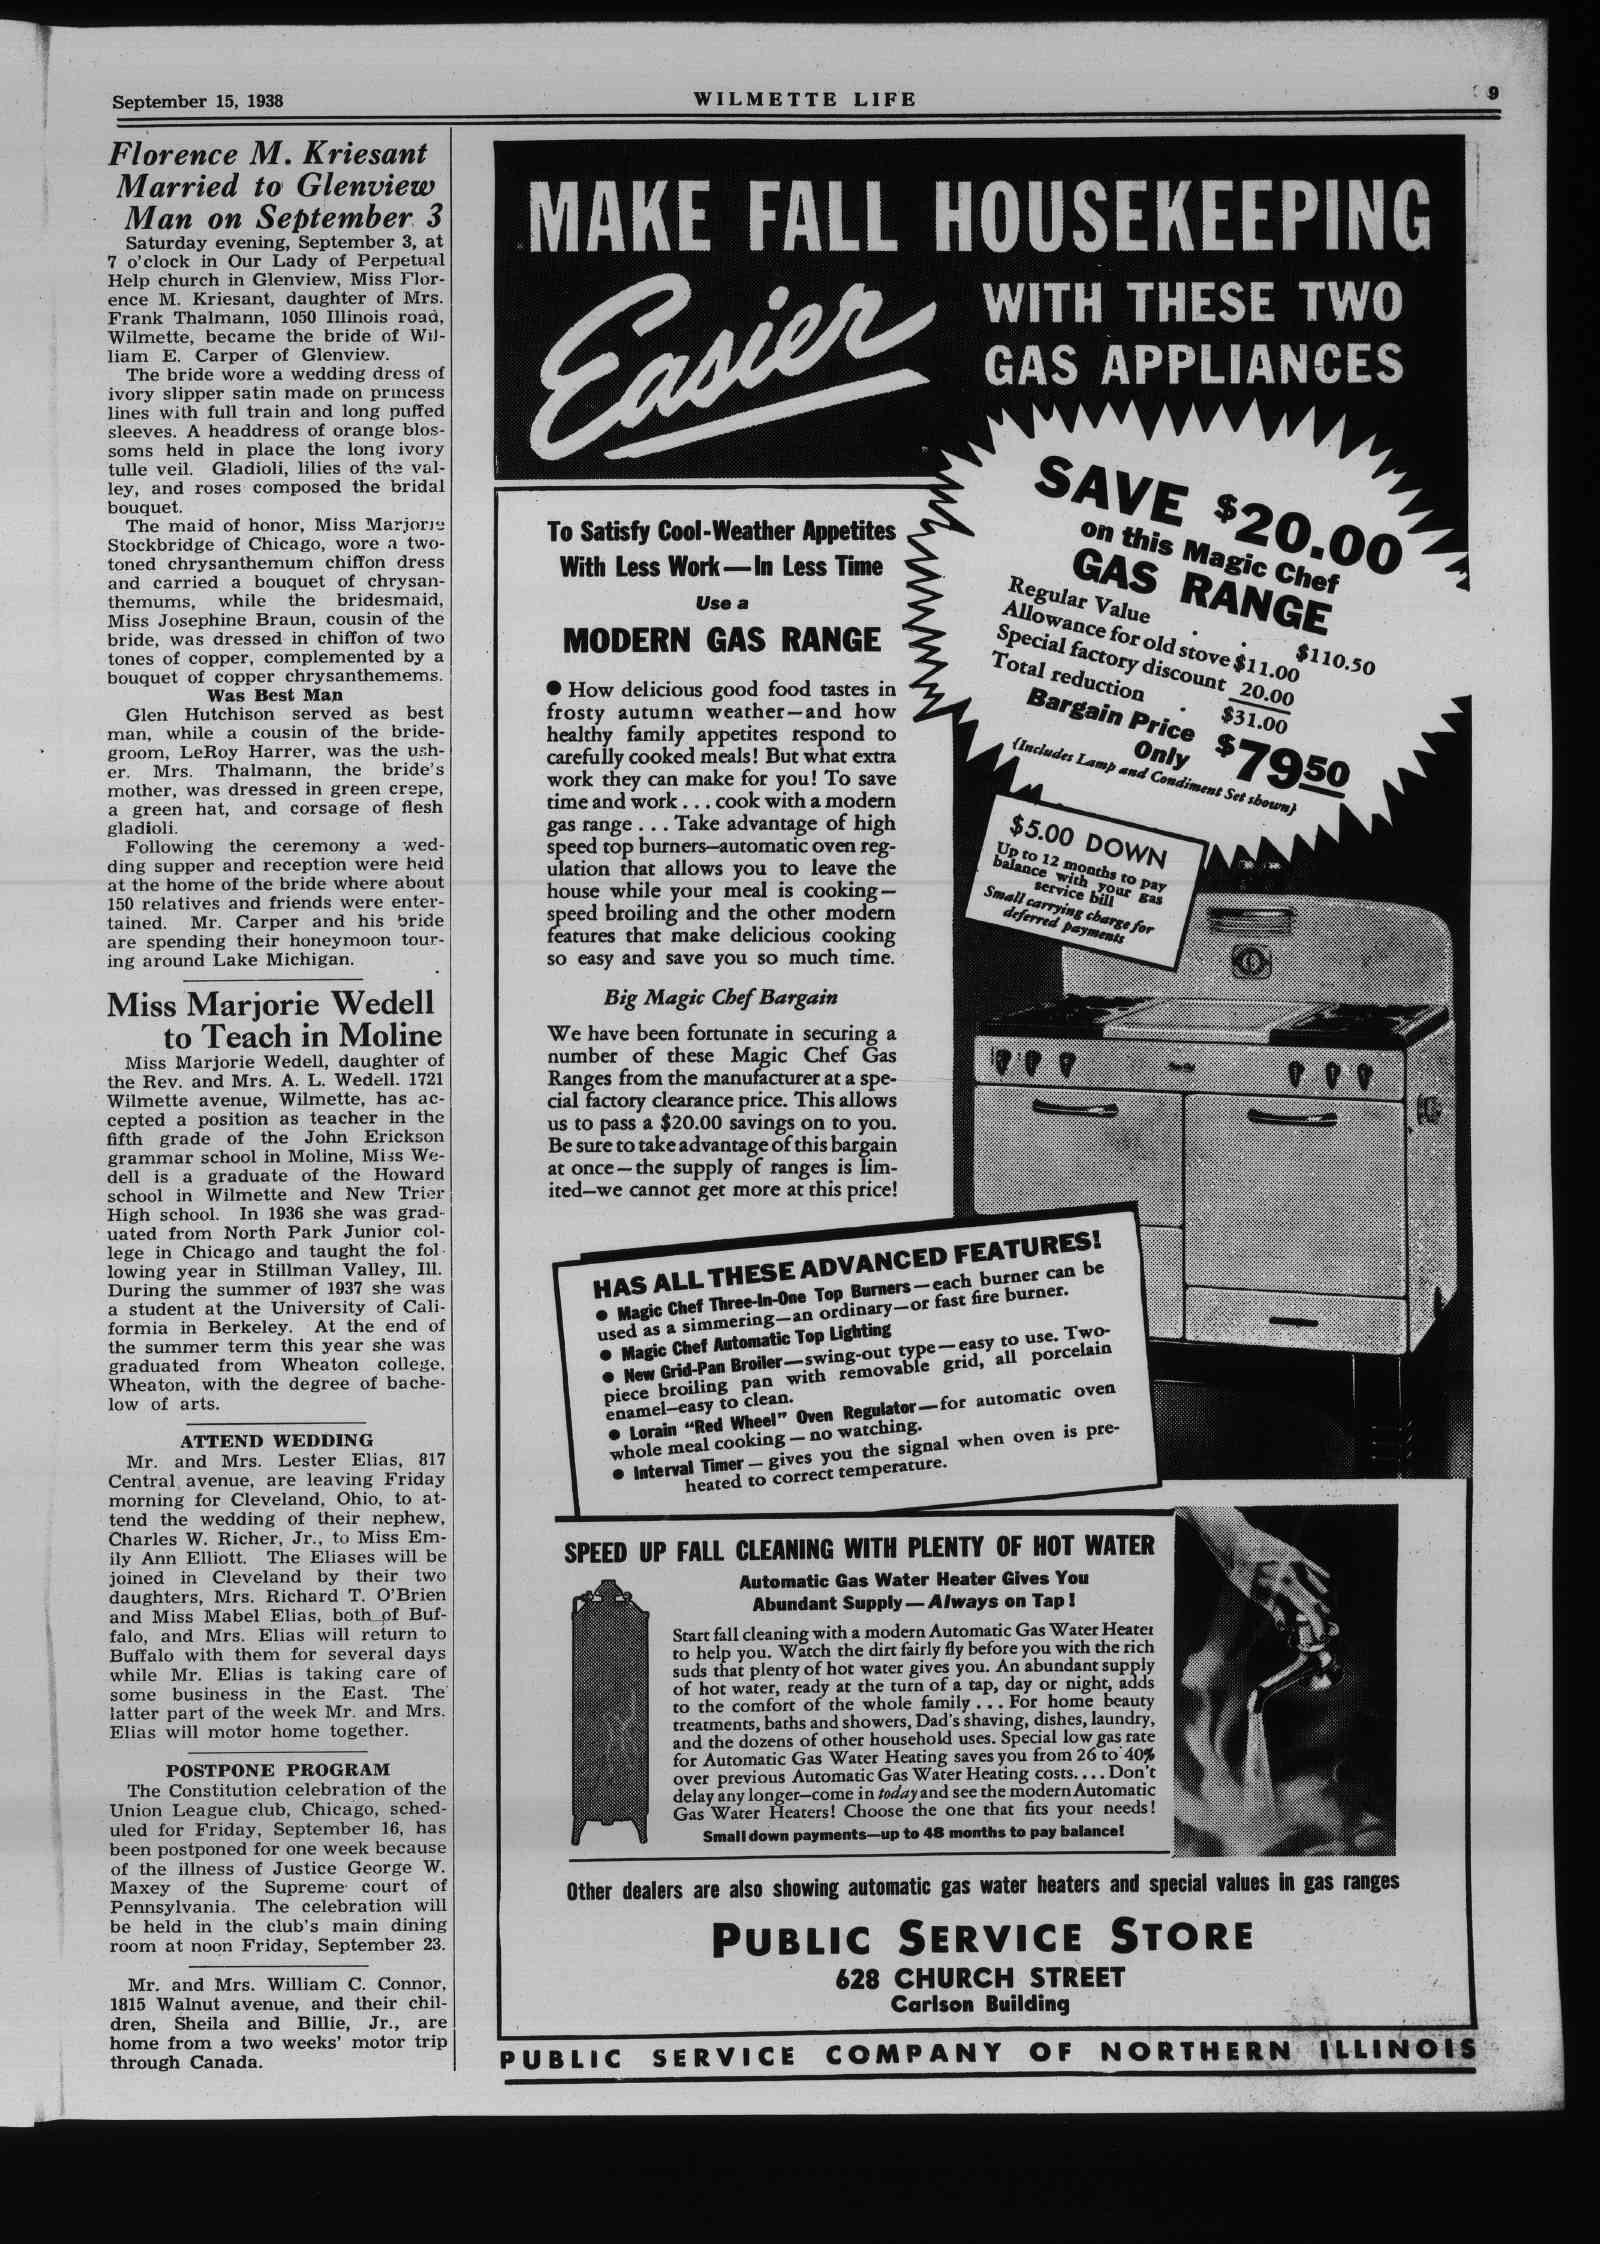 Wilmette Life (Wilmette, Illinois), 15 Sep 1938